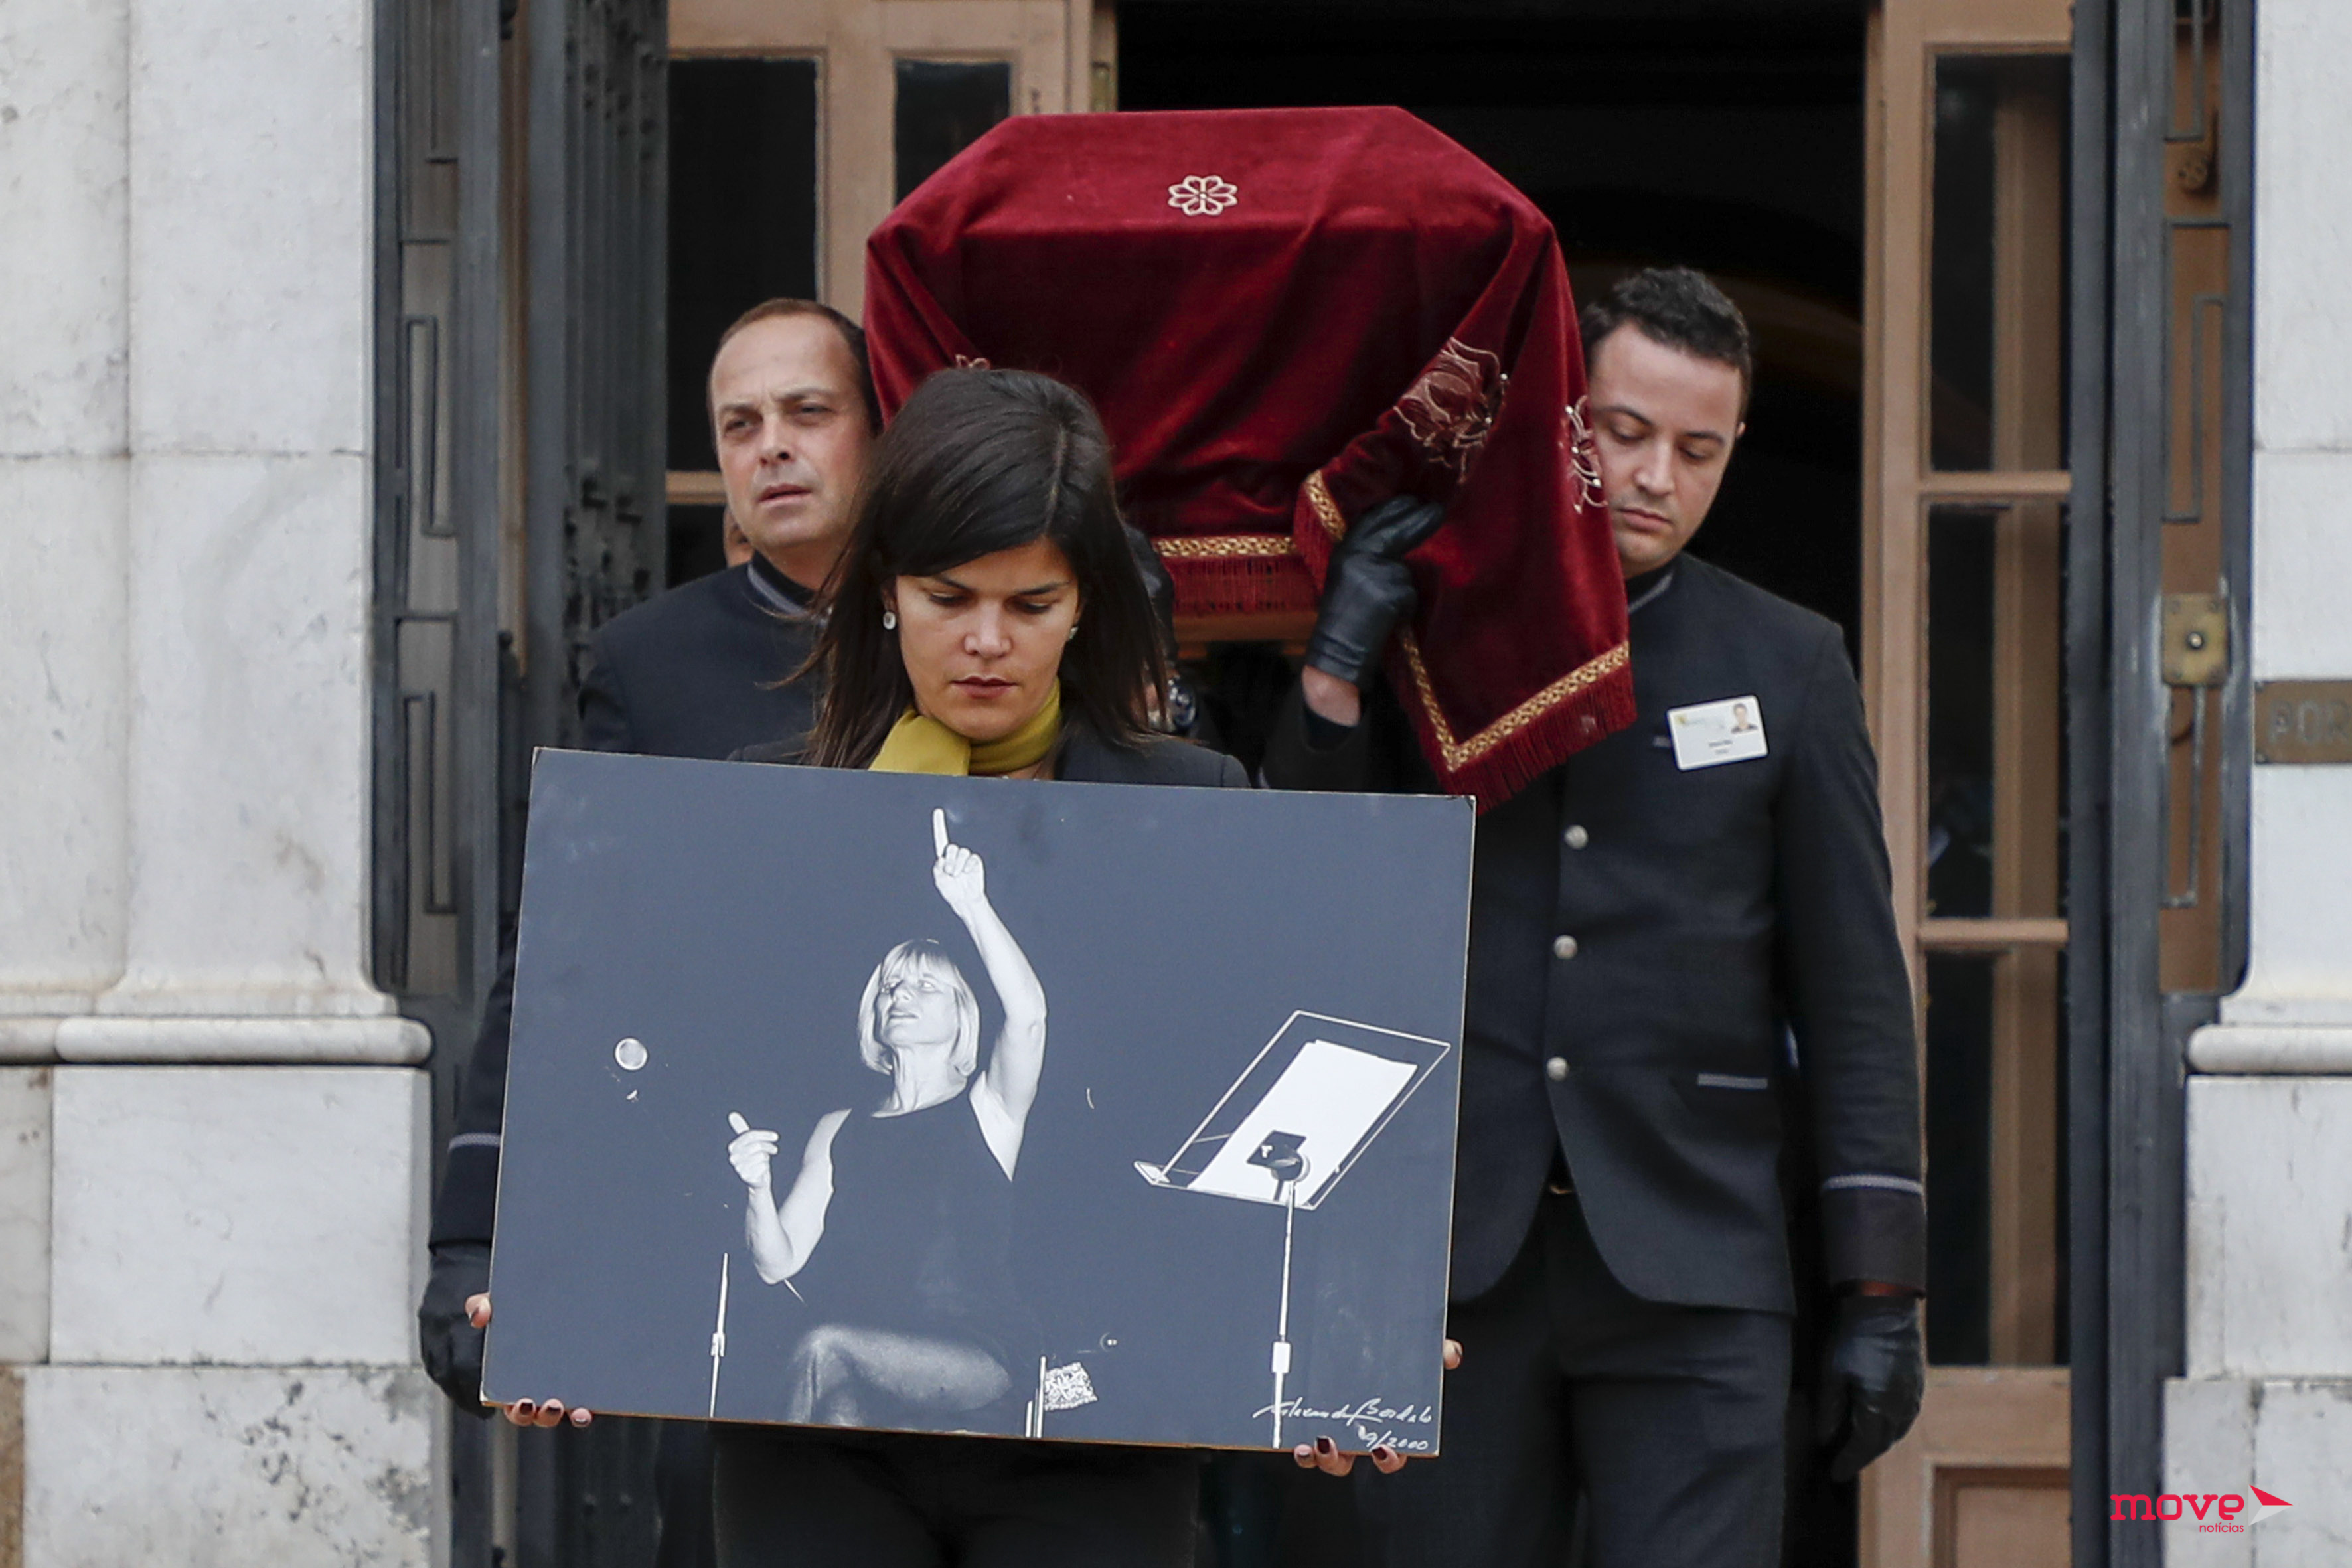 Morreu a atriz Guida Maria